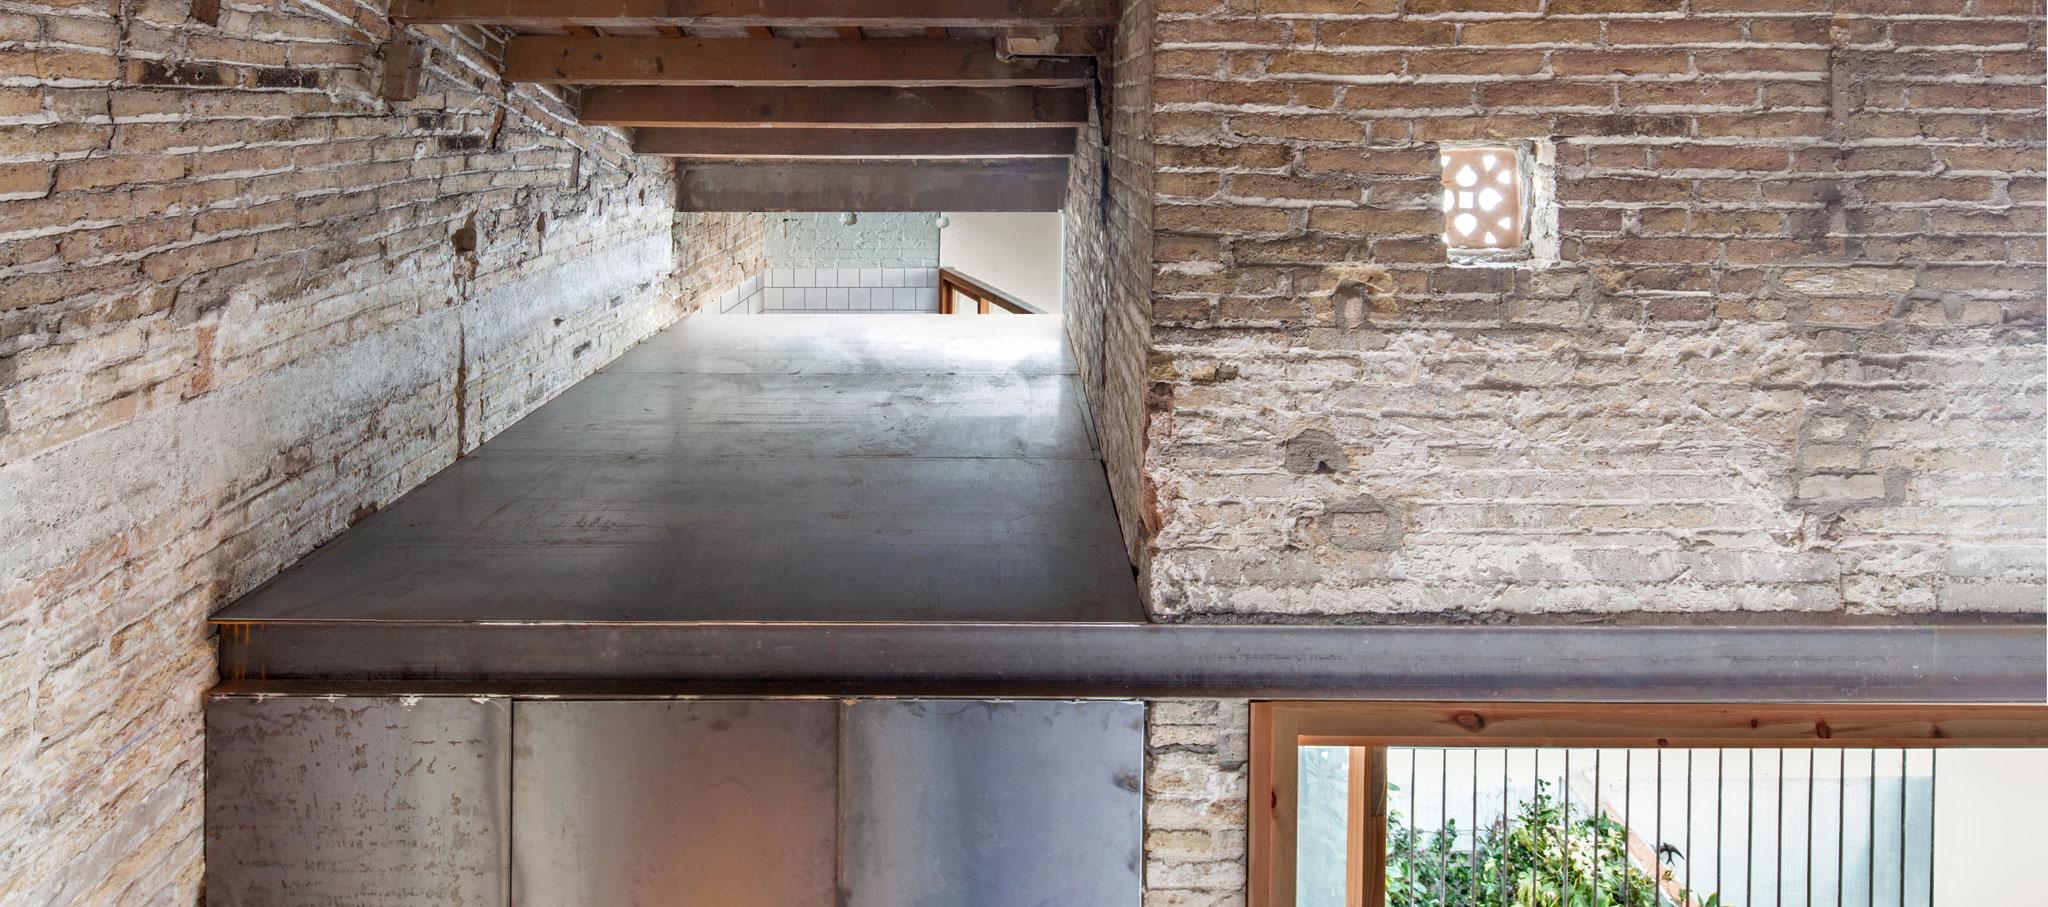 Tubella house by ÁGORA Arquitectura. Photograph by Joan Casalspañella